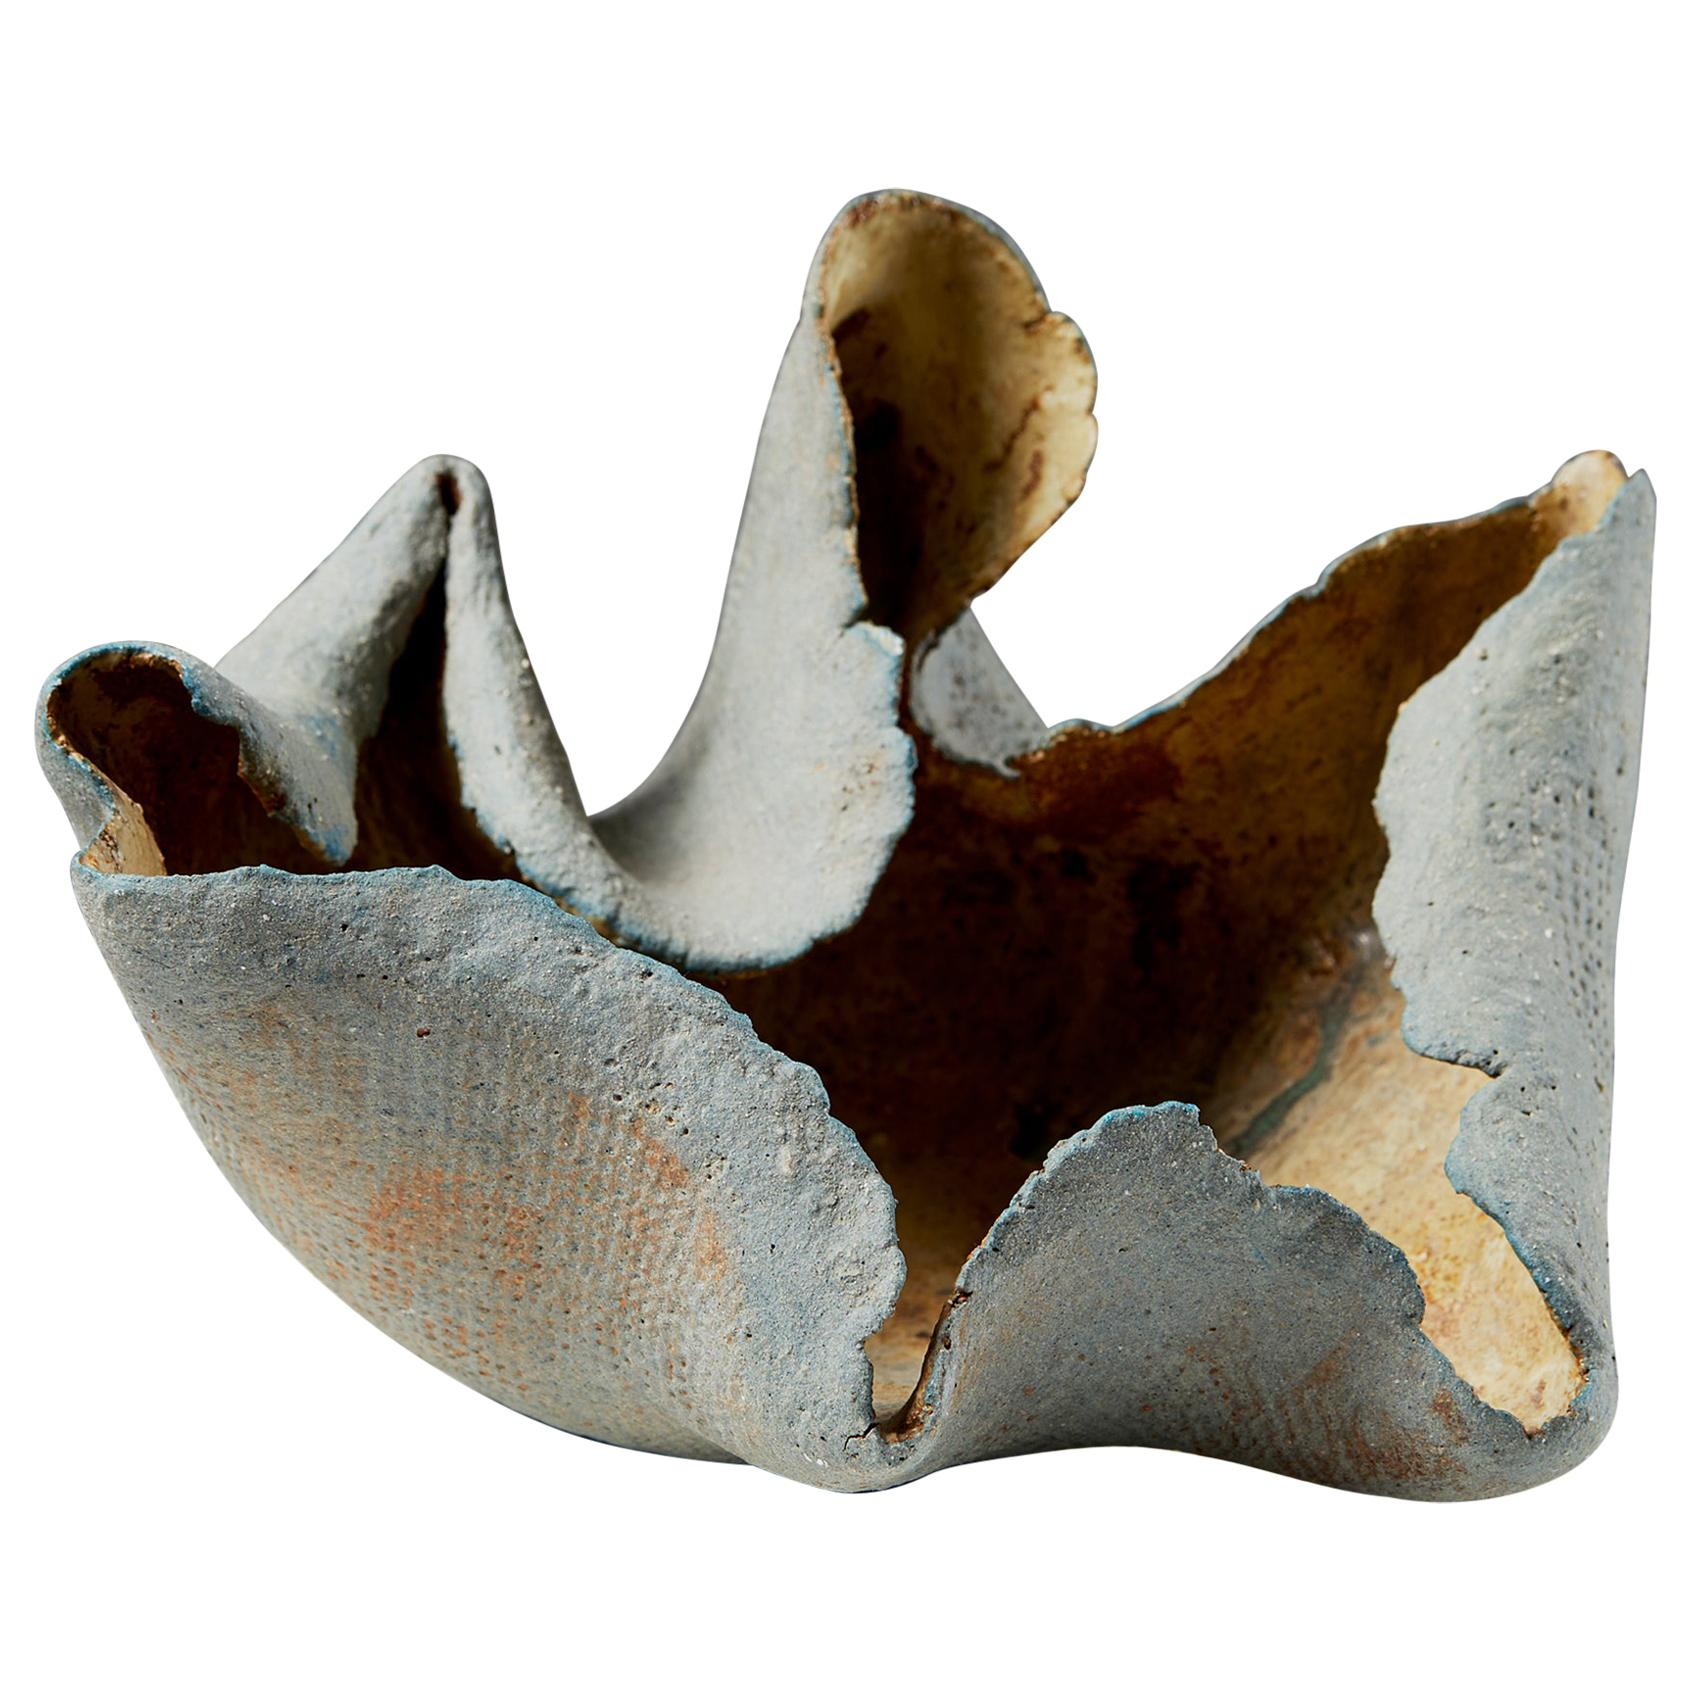 Bowl/Sculpture Designed by Tyra Lundgren, Sweden, 1950's